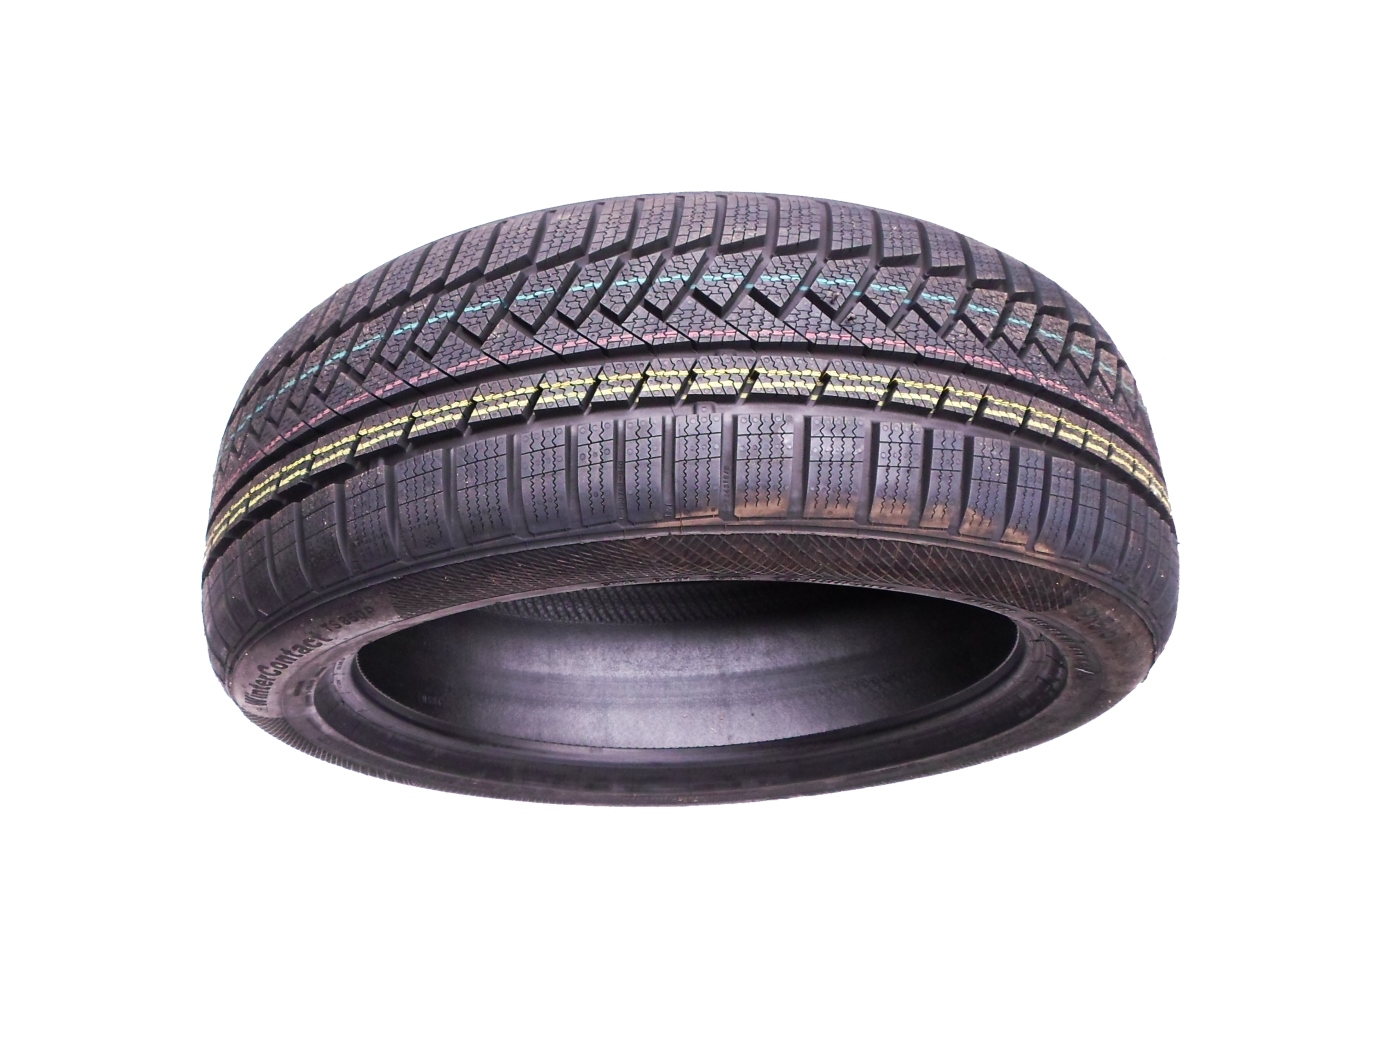 Opony Zimowe Continental Ts 850 Suv 21550r18 6746181867